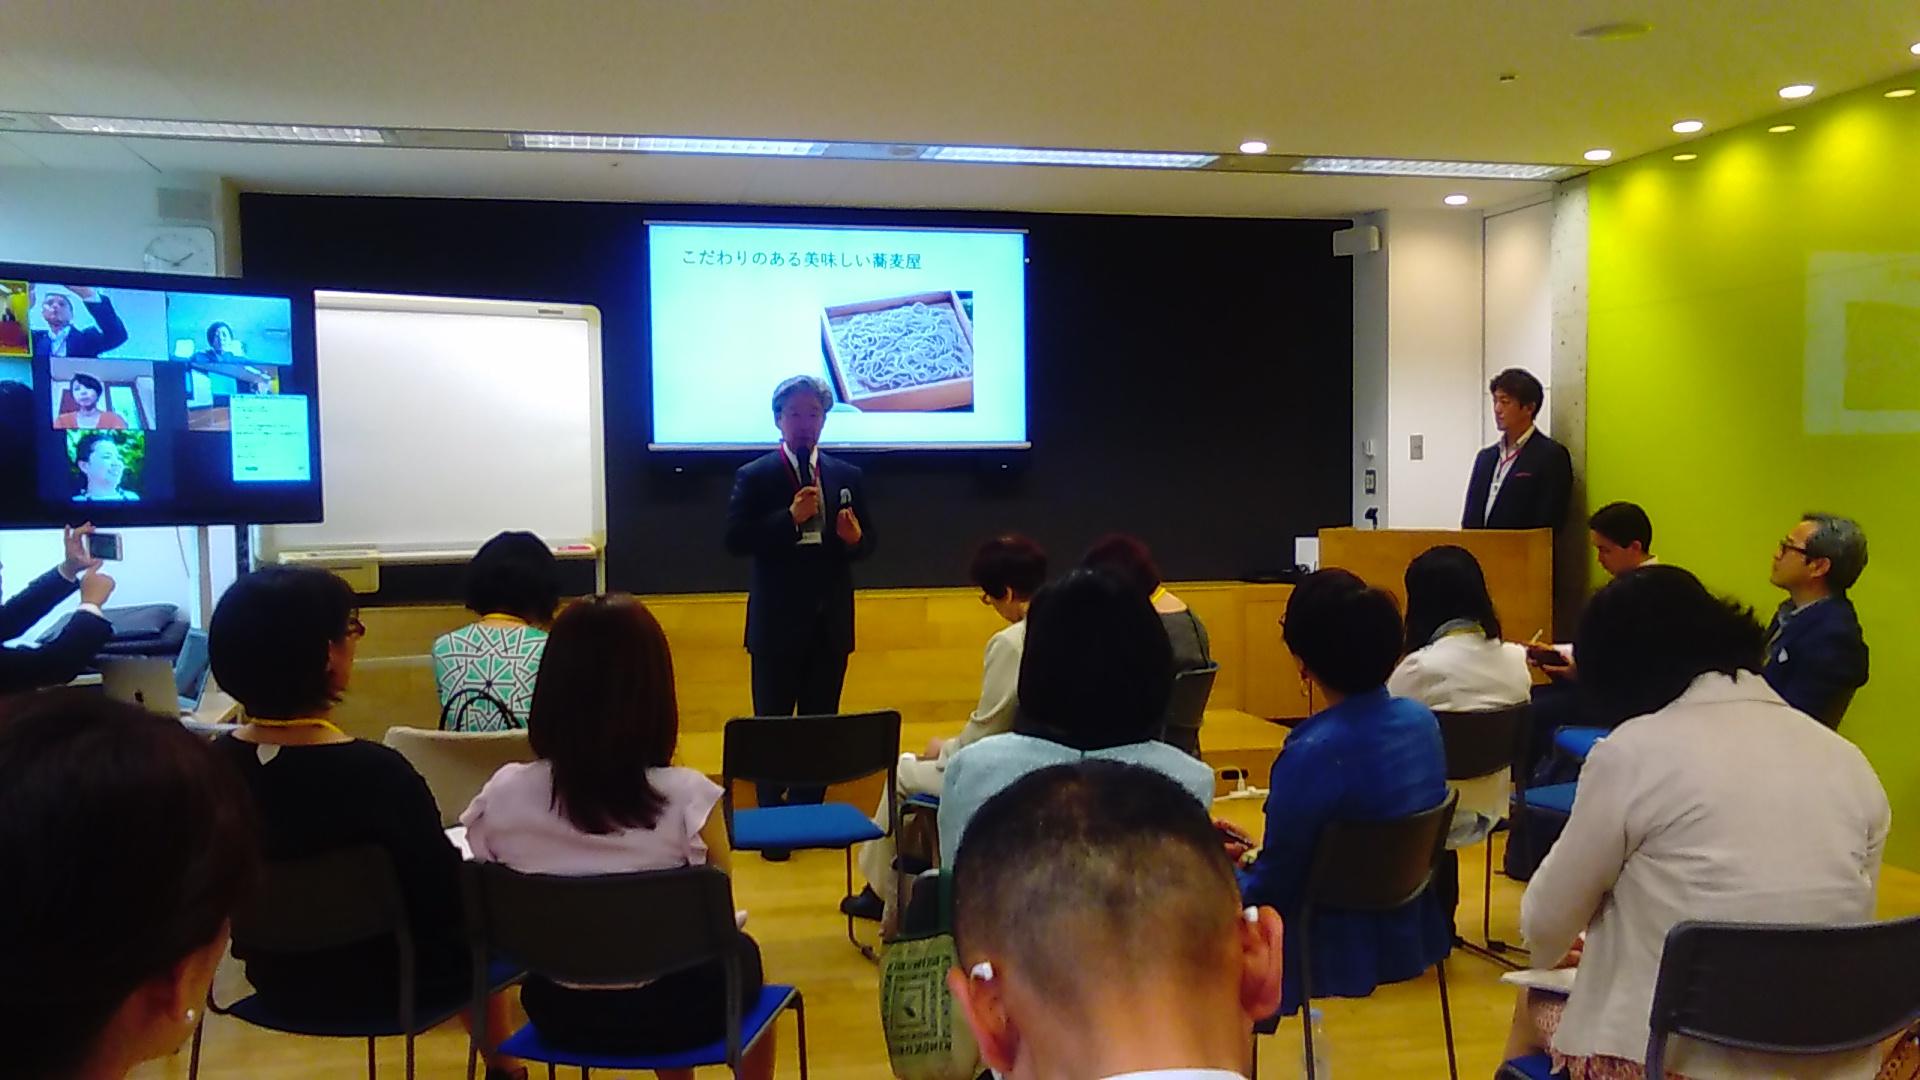 KIMG1301 - 100年続く美しい会社プロジェクト ブラッシュアップ講座開催